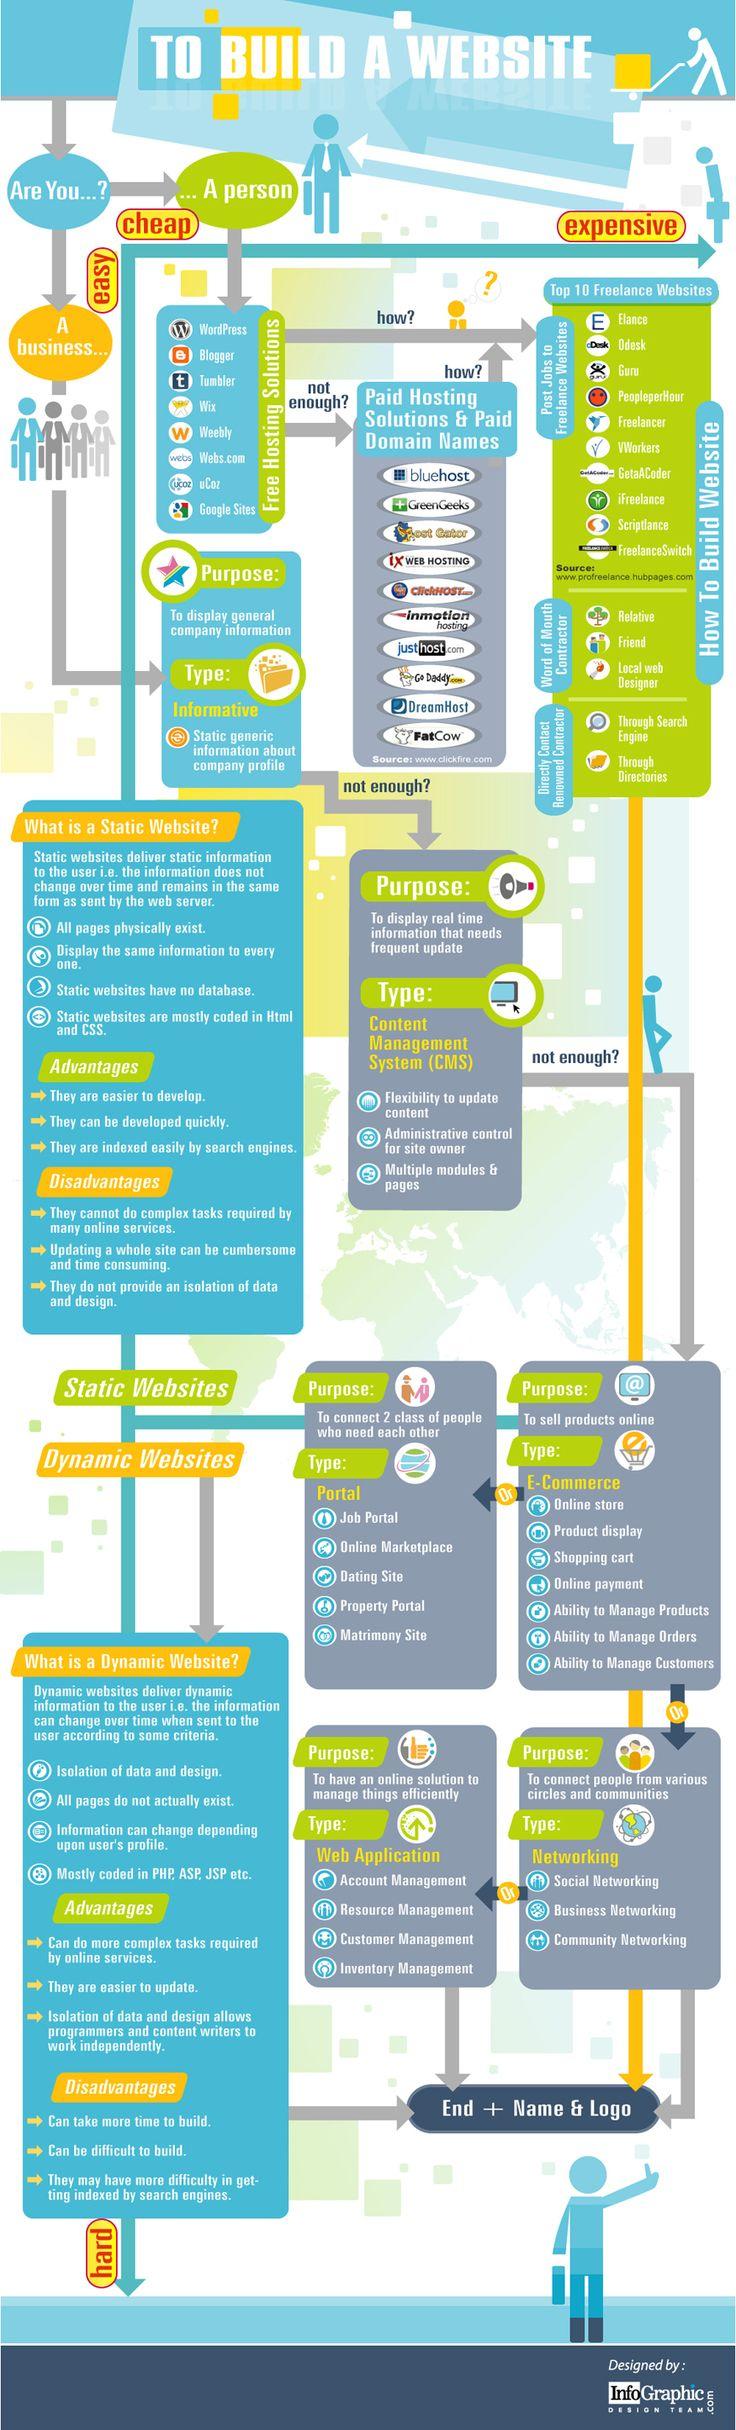 Esquema para construir tu sitio web #infografia #infographic #internet vía @antoniogalindog